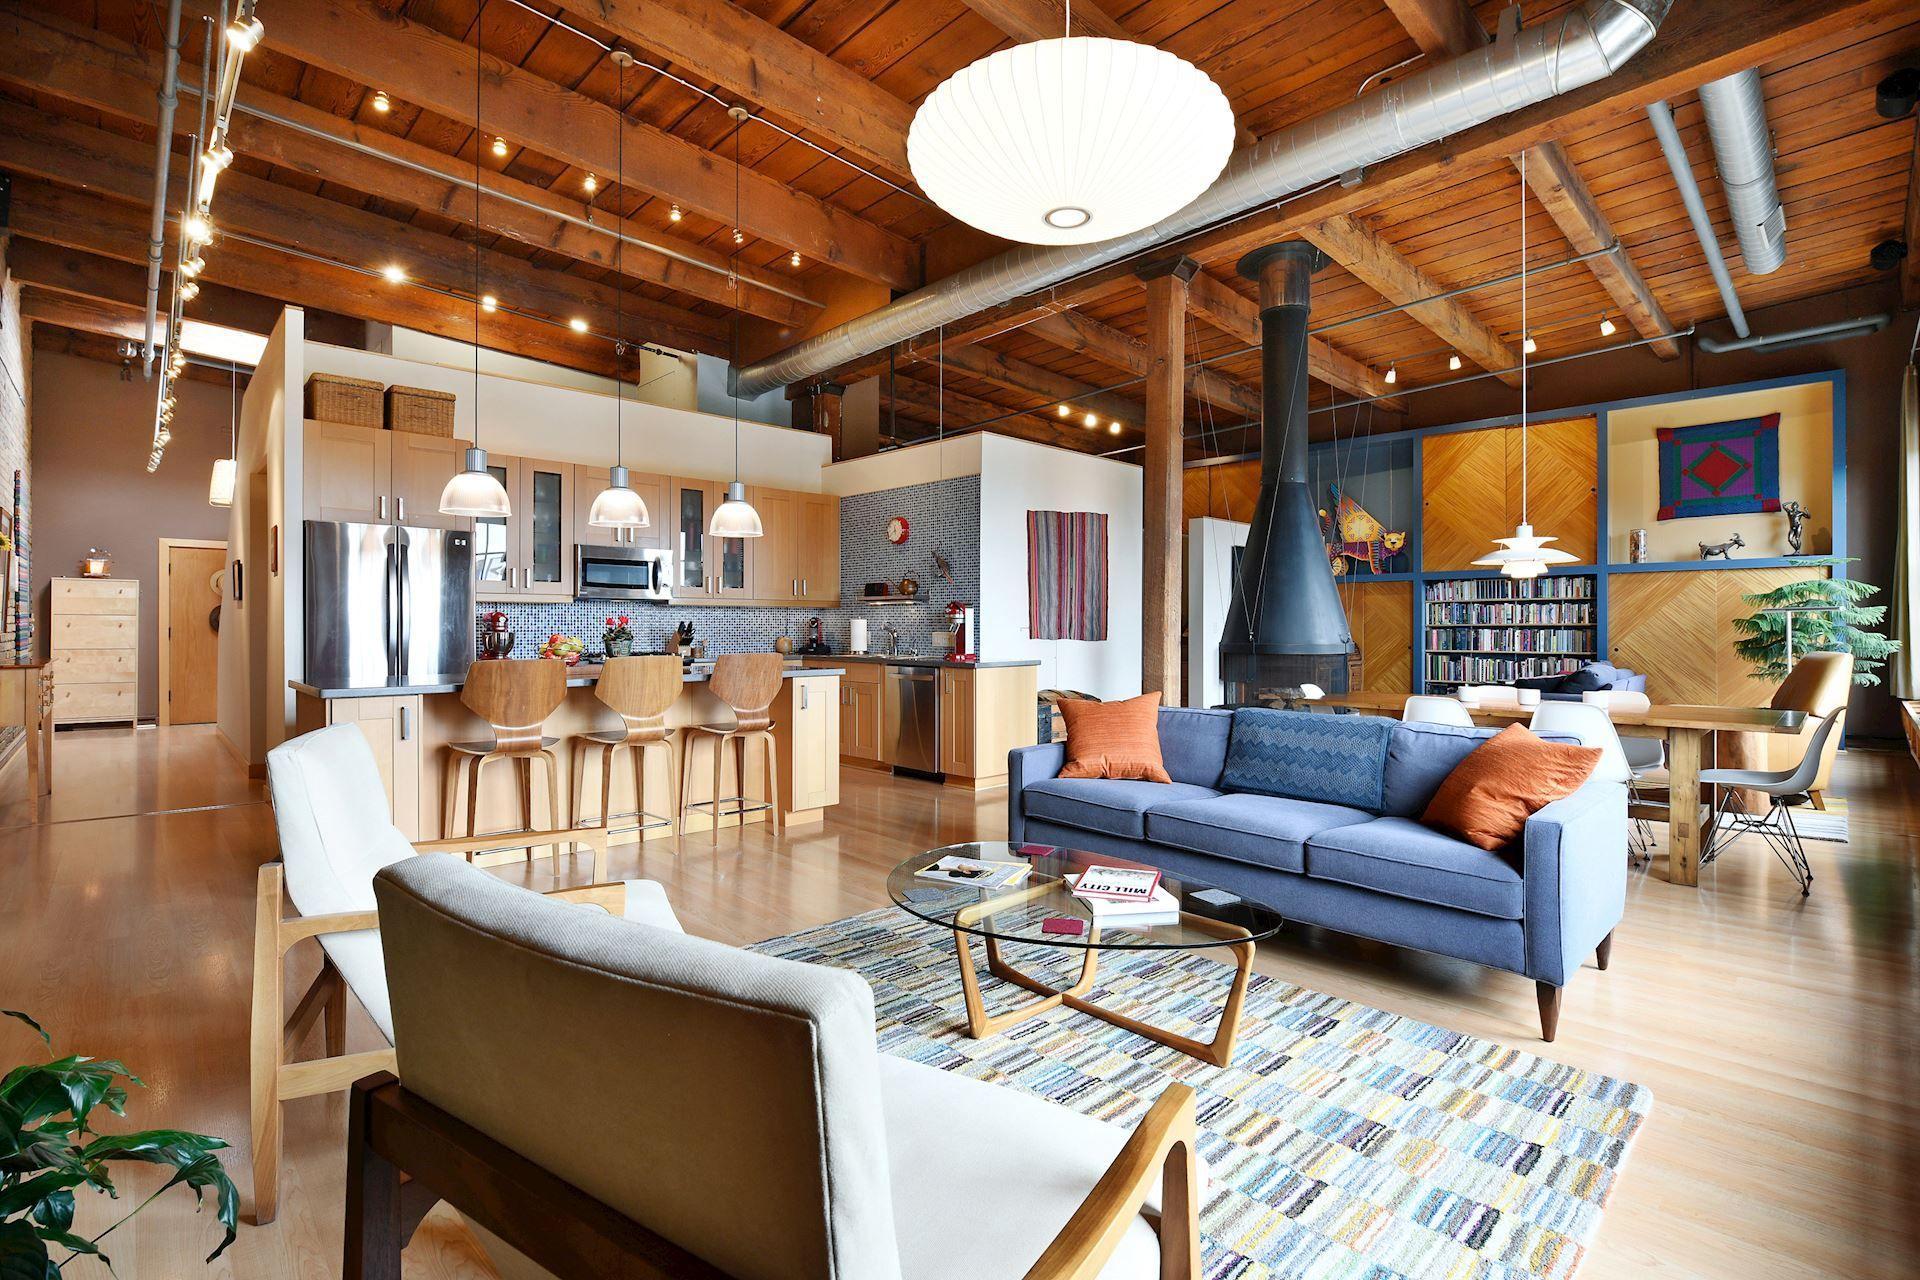 Lifestyle for Sale in Minneapolis's North Loop Luxury